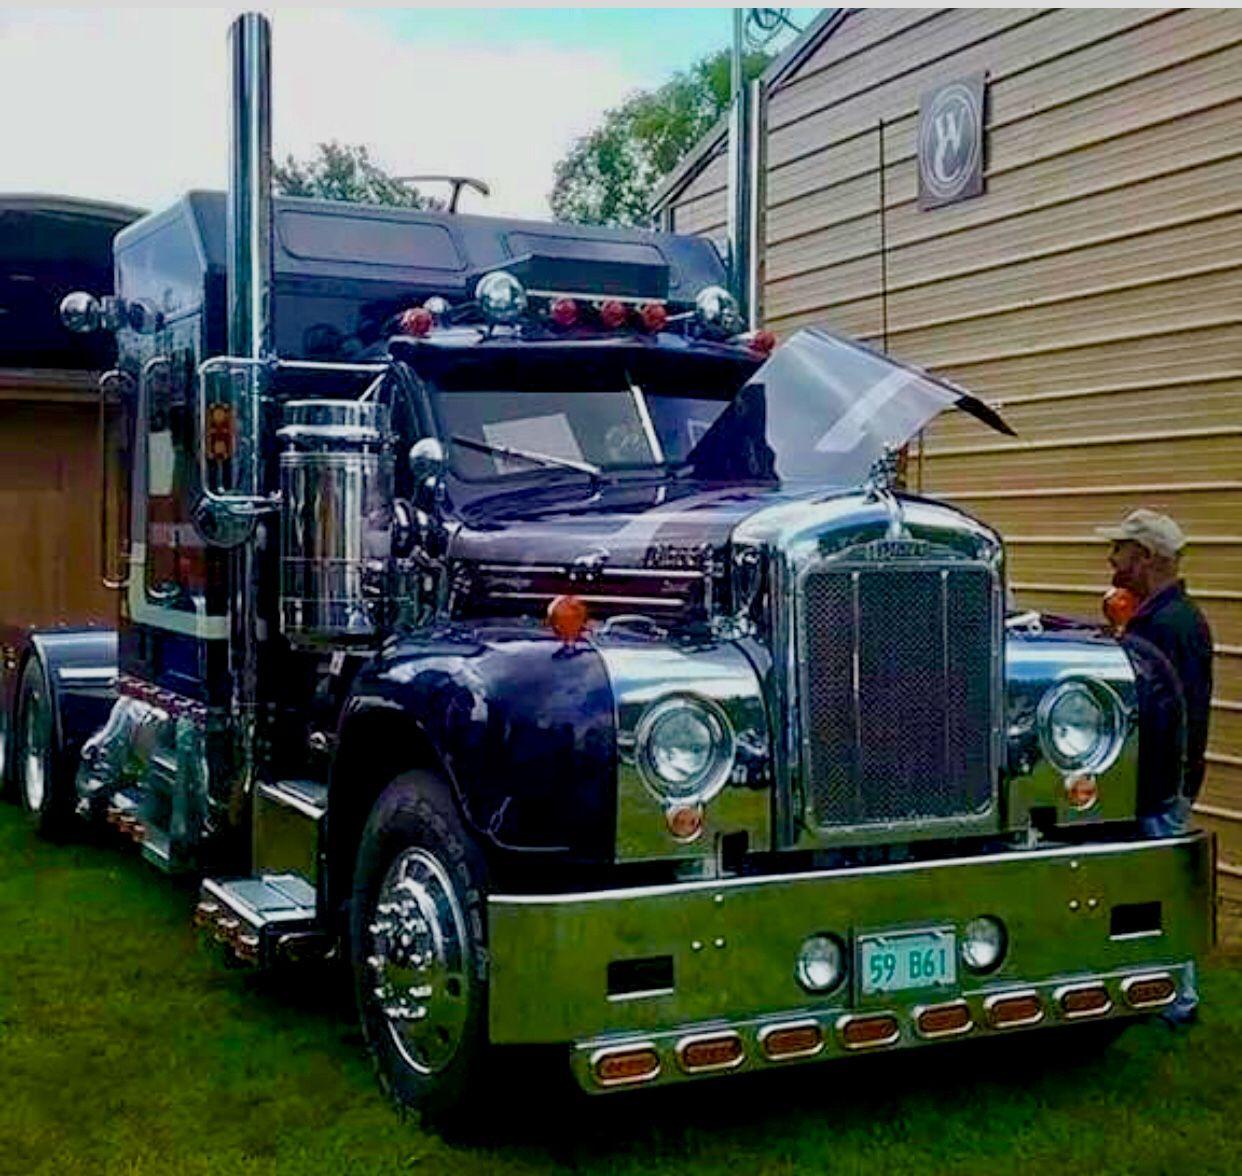 Mack B Model With Images Big Rig Trucks Mack Trucks Big Trucks